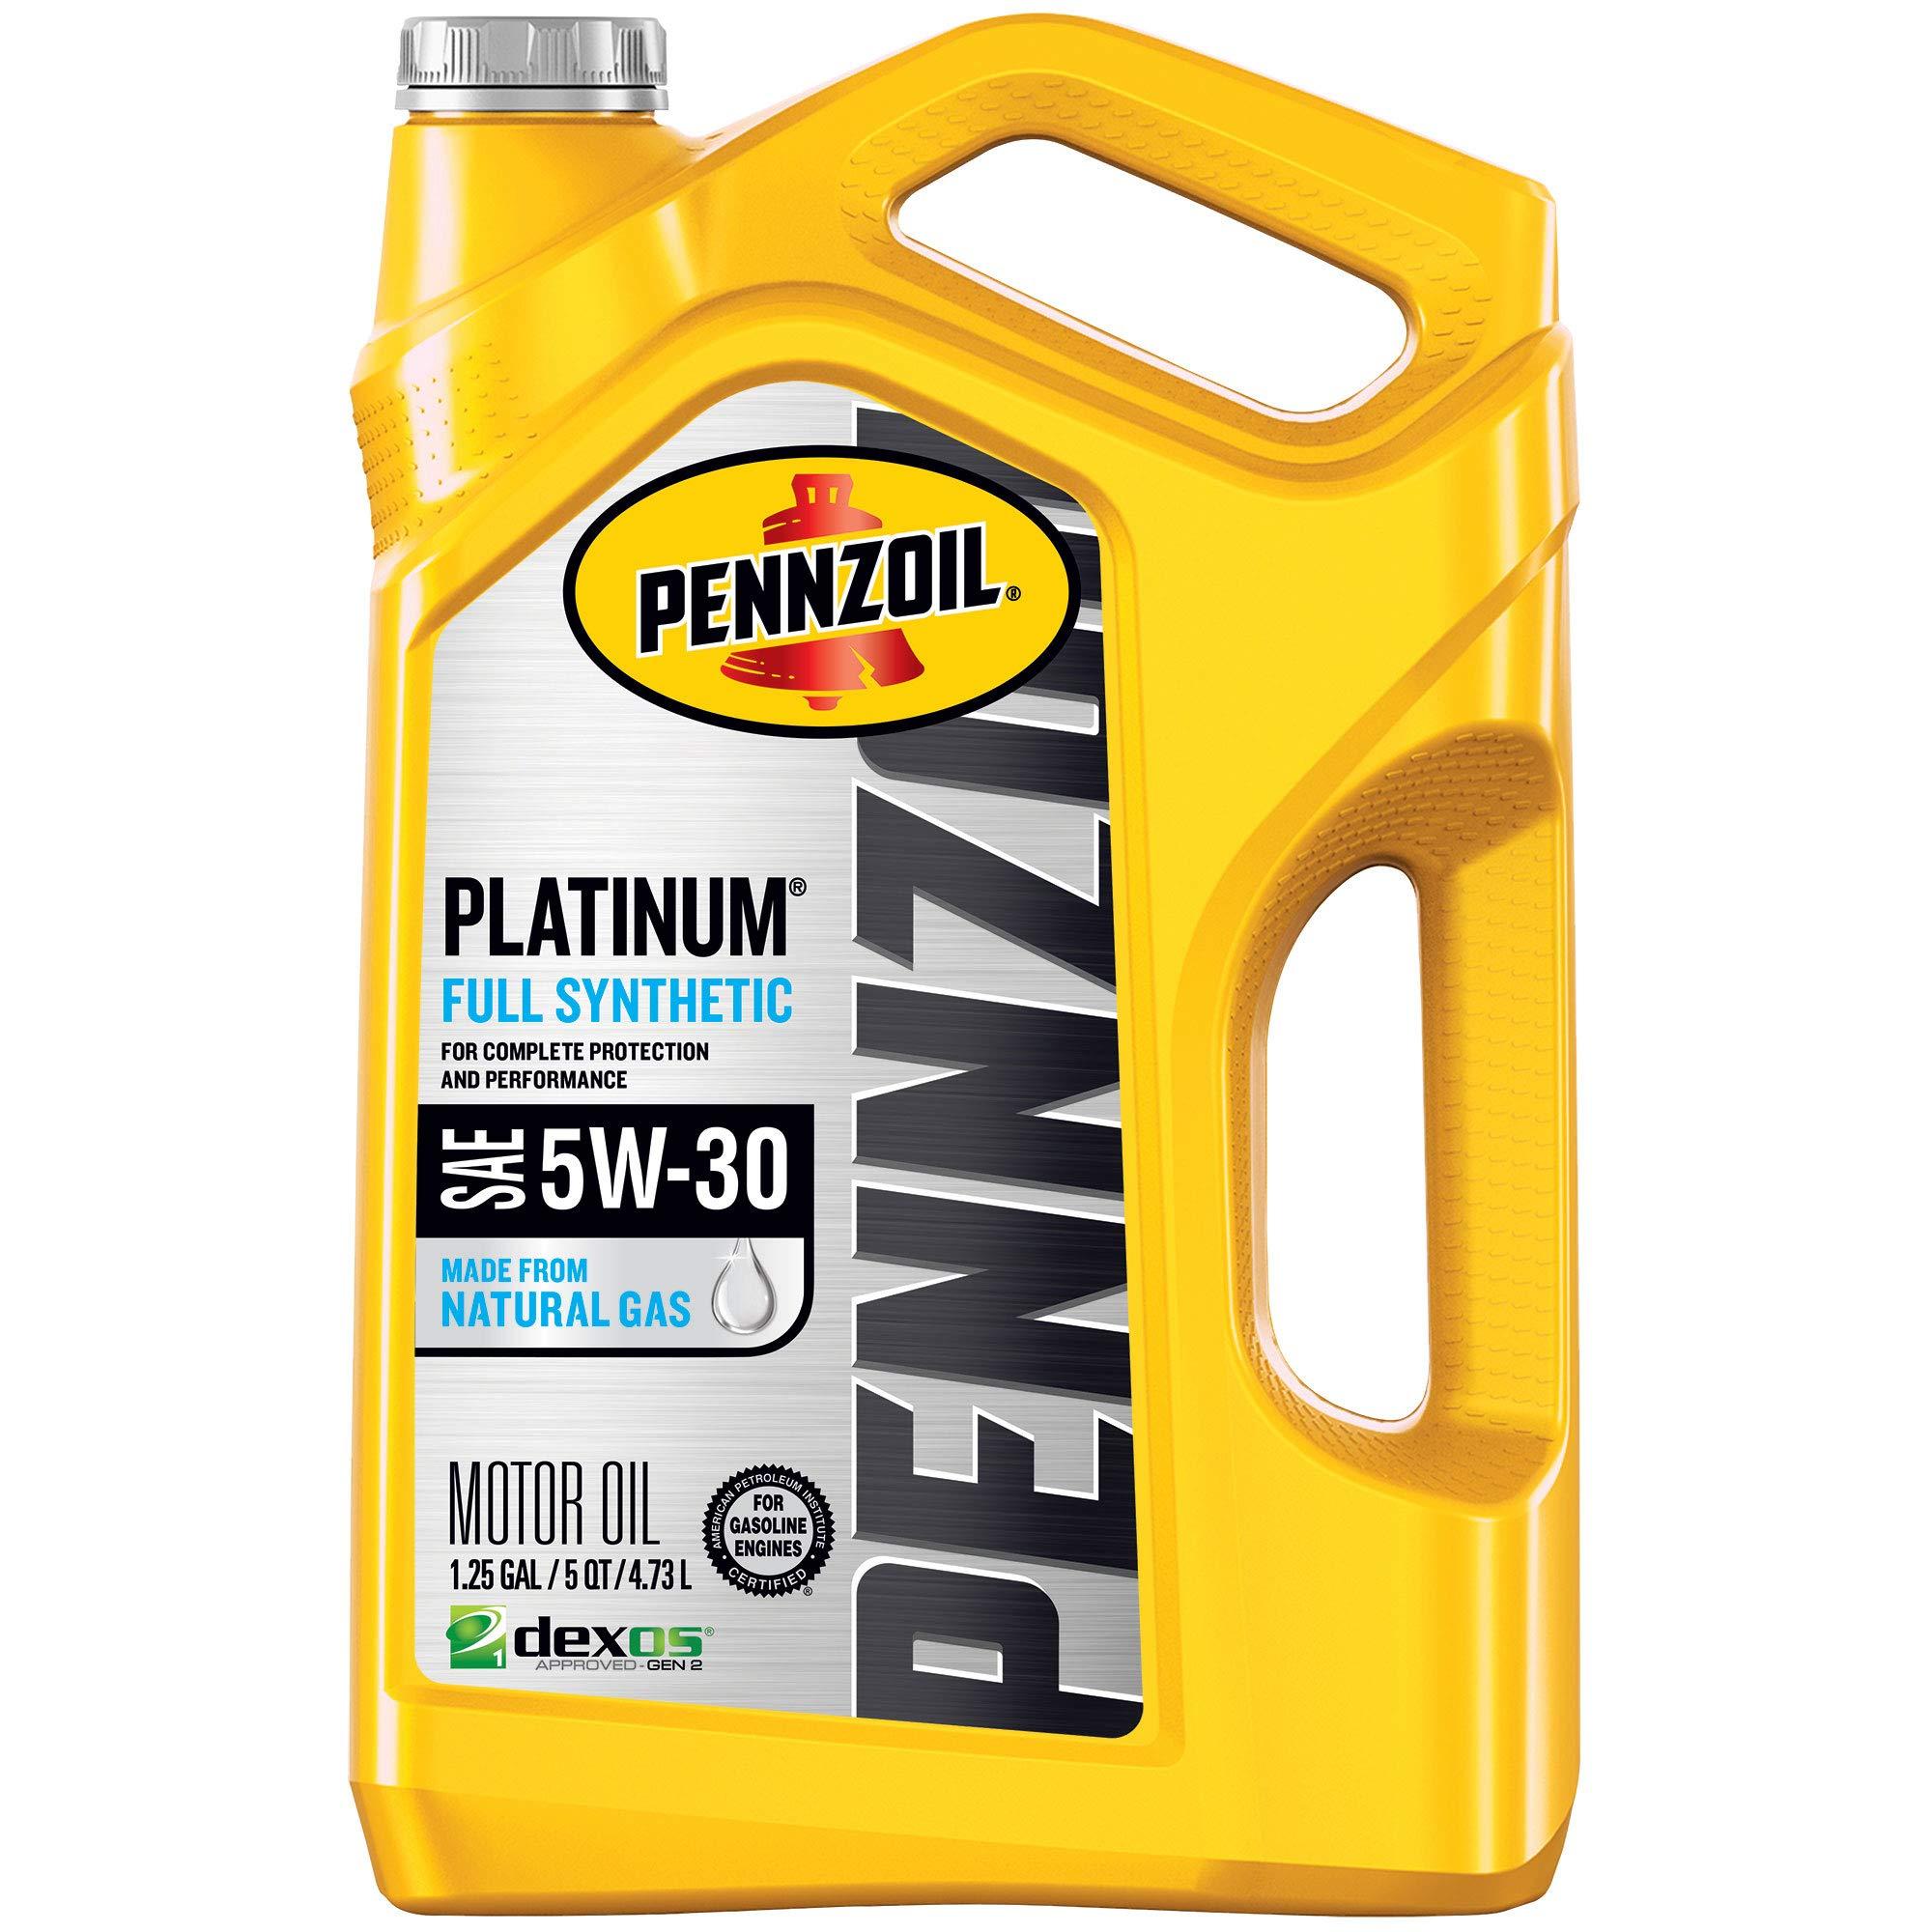 Pennzoil Platinum Full Synthetic 5W-30 Motor Oil (5-Quart, Single-Pack), Packaging May Vary